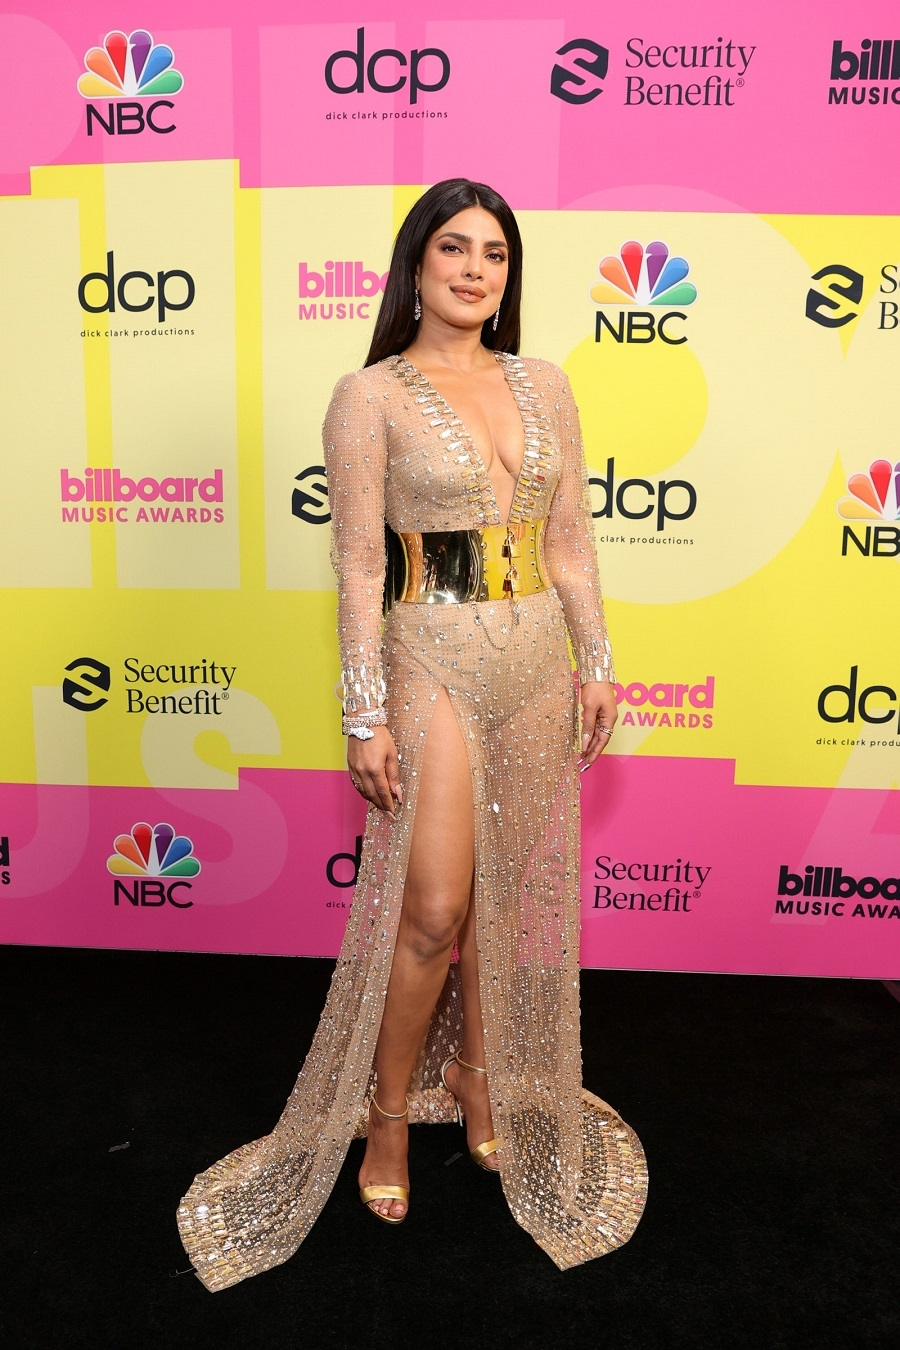 Billboard Music Awards 2021: Меган Фокс, Приянка Чопра, P!nk и другие на красной дорожке премии (ФОТО) - фото №3